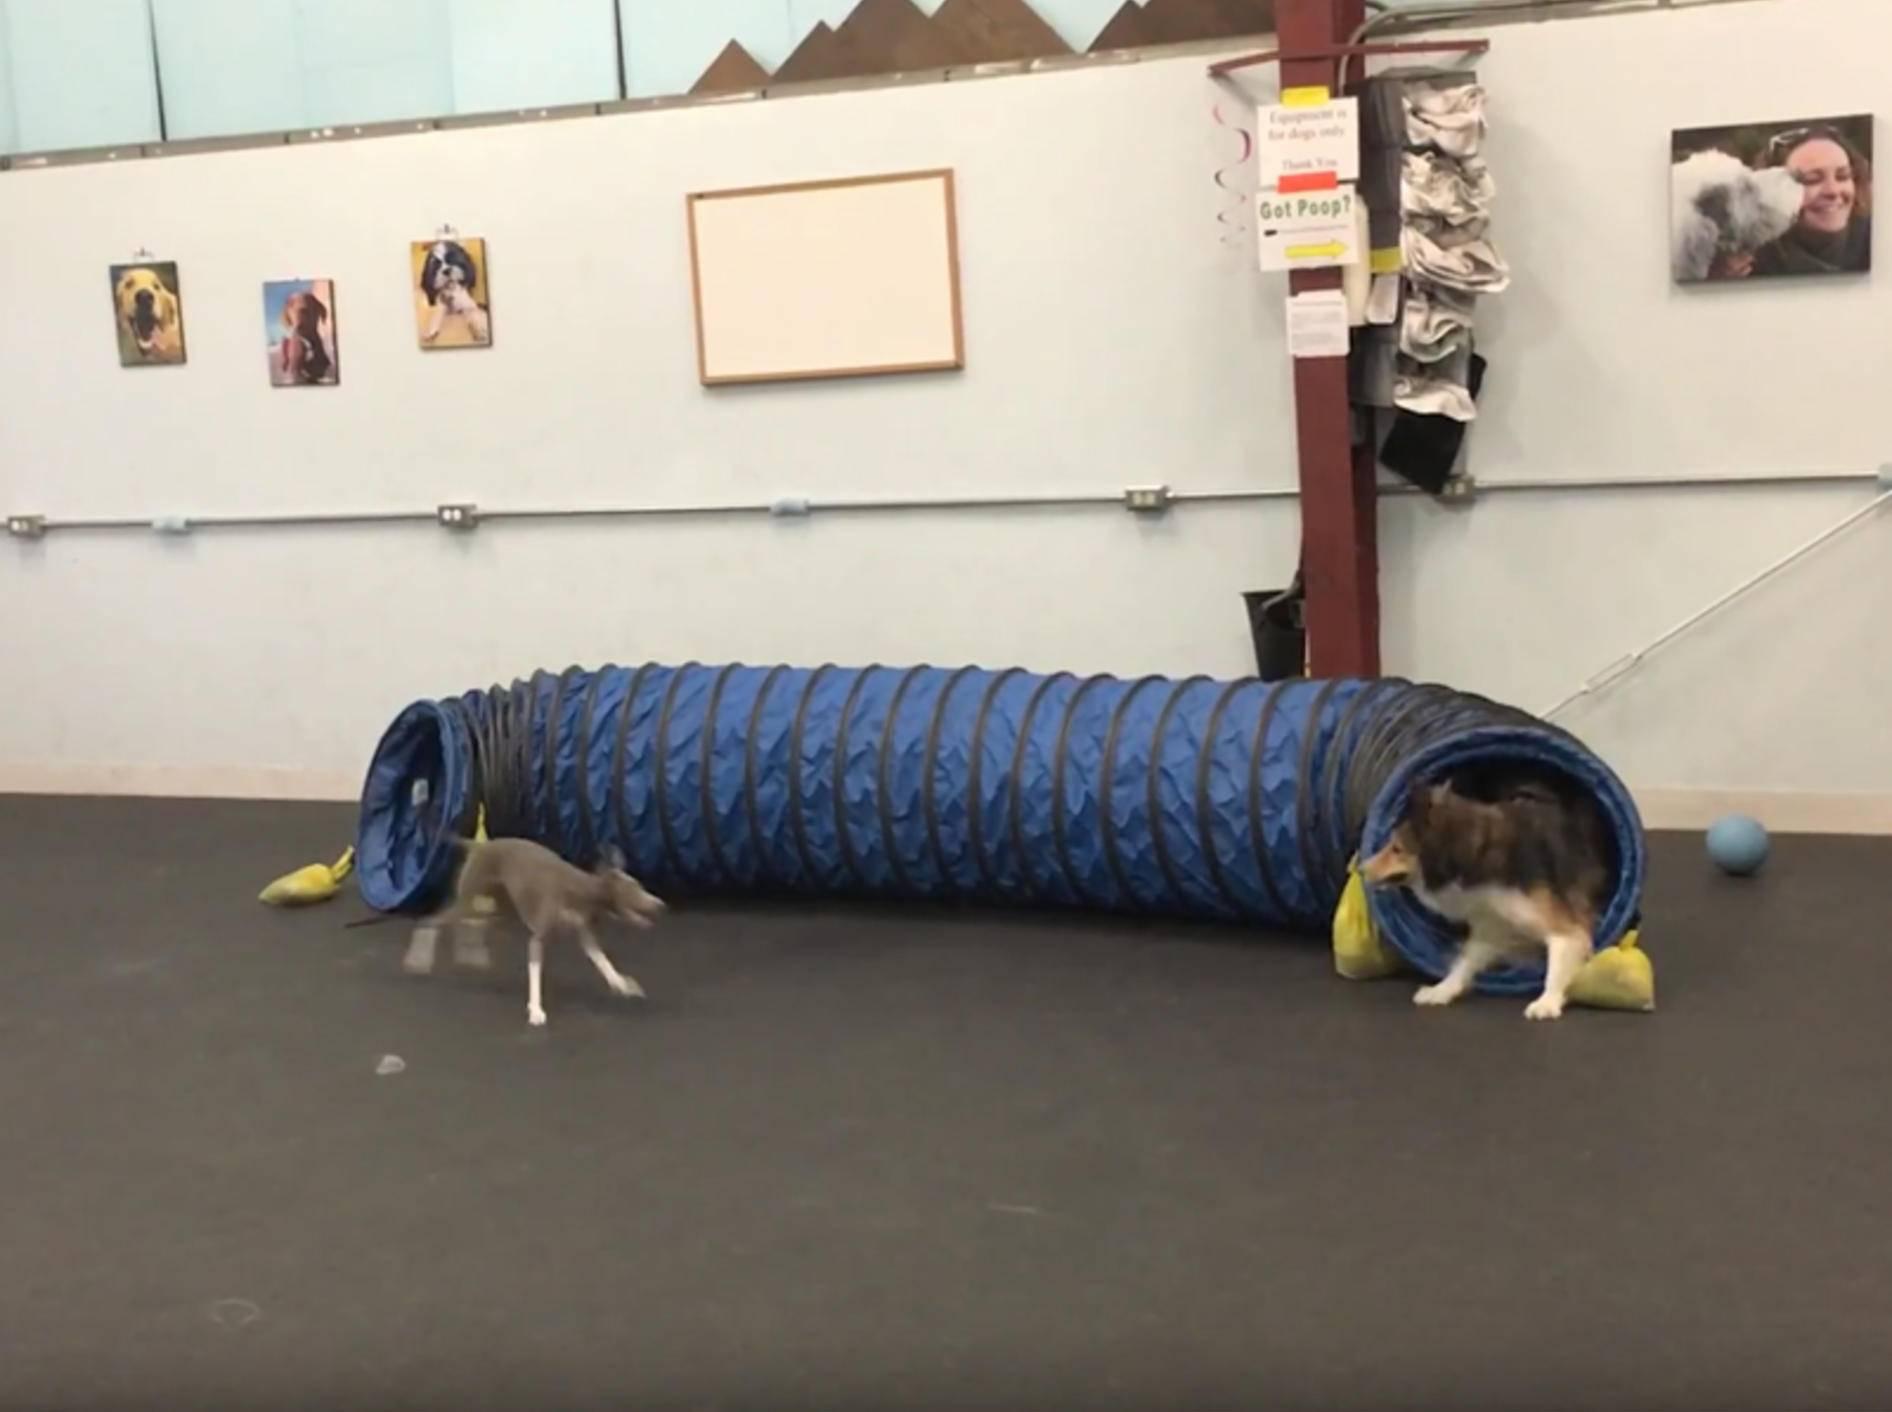 Italienisches Windspiel Penelope spielt Fangen mit Hundekumpel – YouTube / Matt Buckmaster